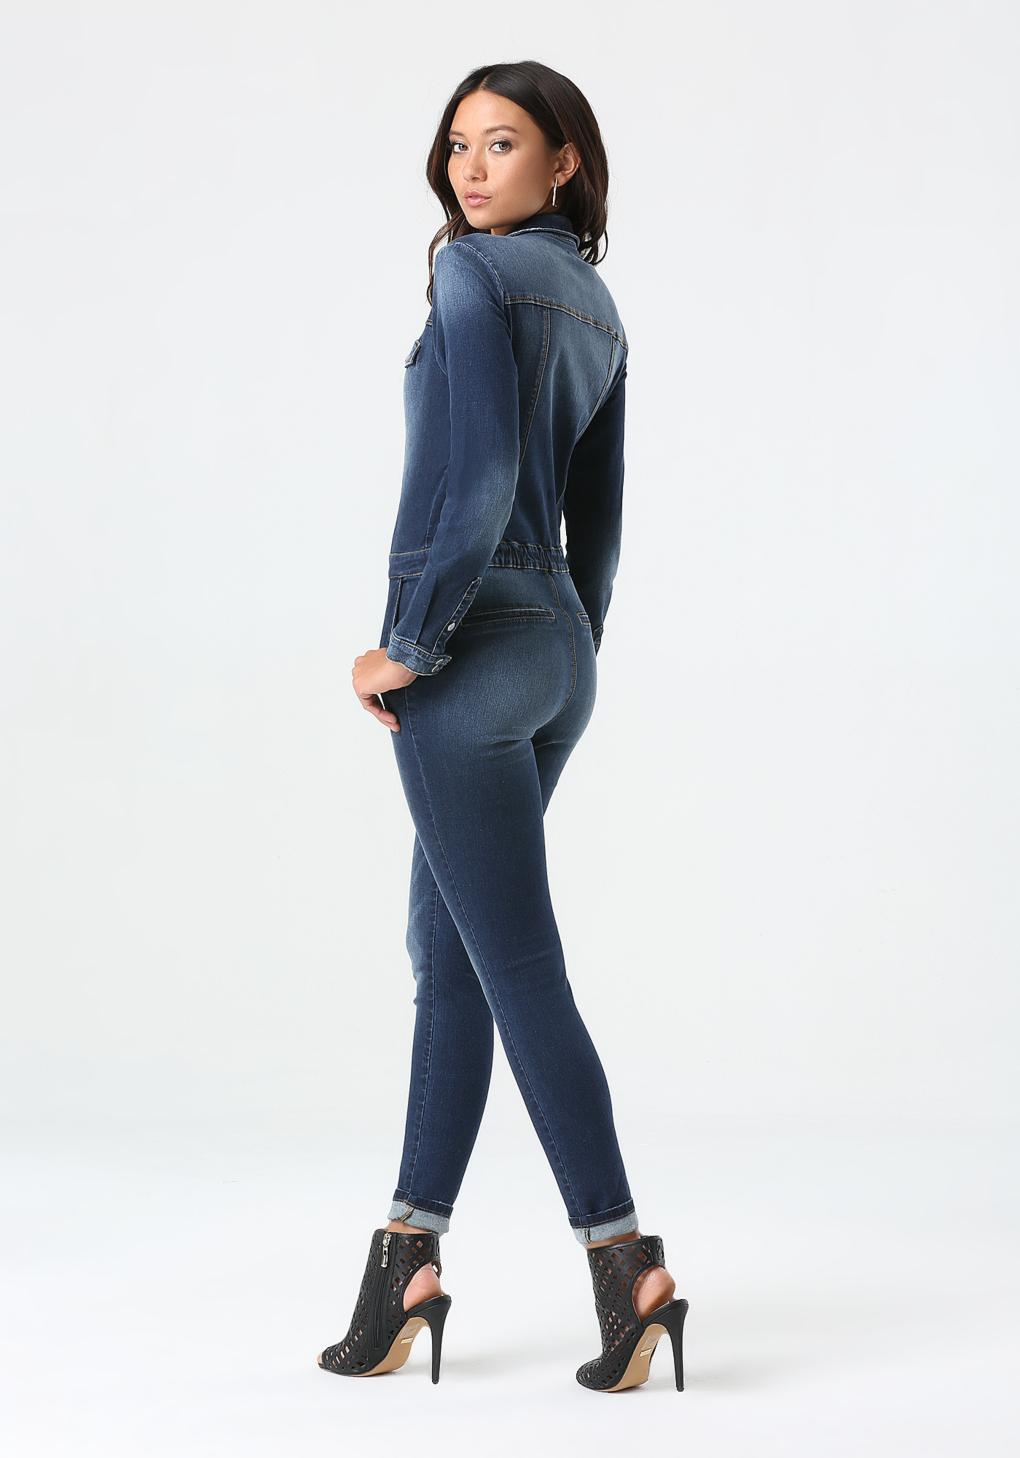 847151092f19a Gallery. Women s Denim Jumpsuits Women s Halter Rompers ...